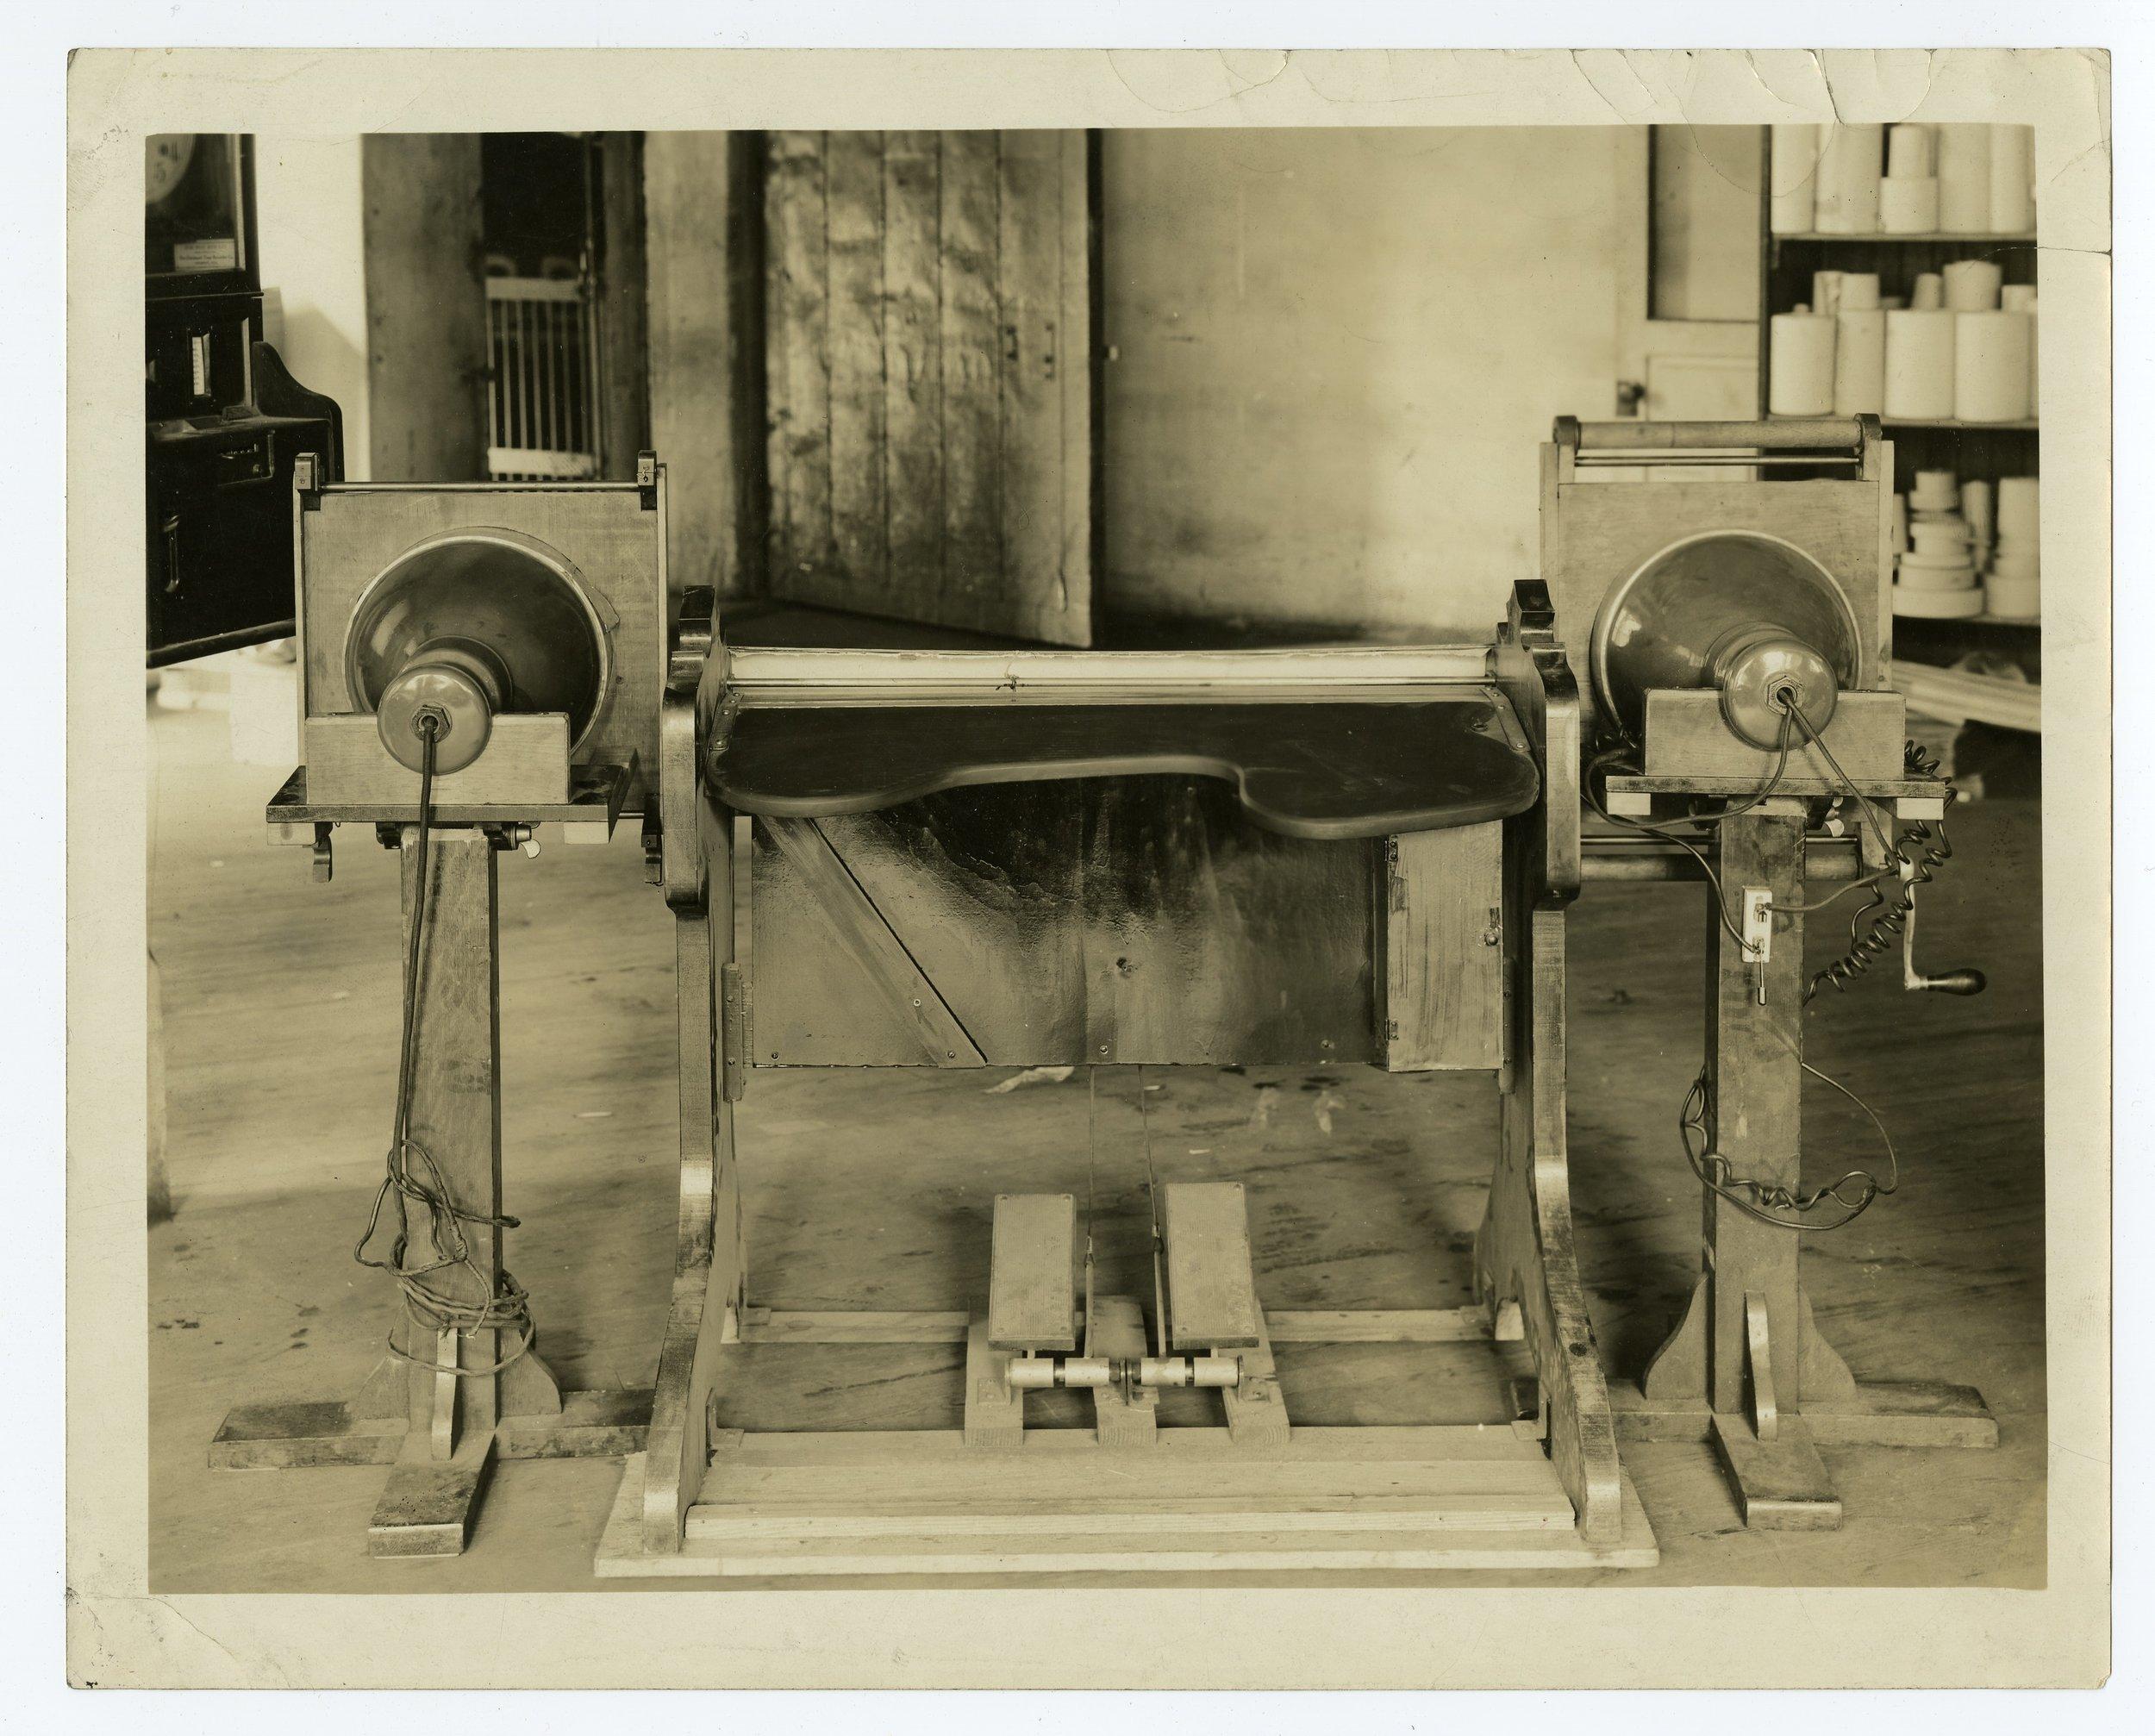 Prototype color organ that Mary Greenewalt created. Historical Society of Pennsylvania.